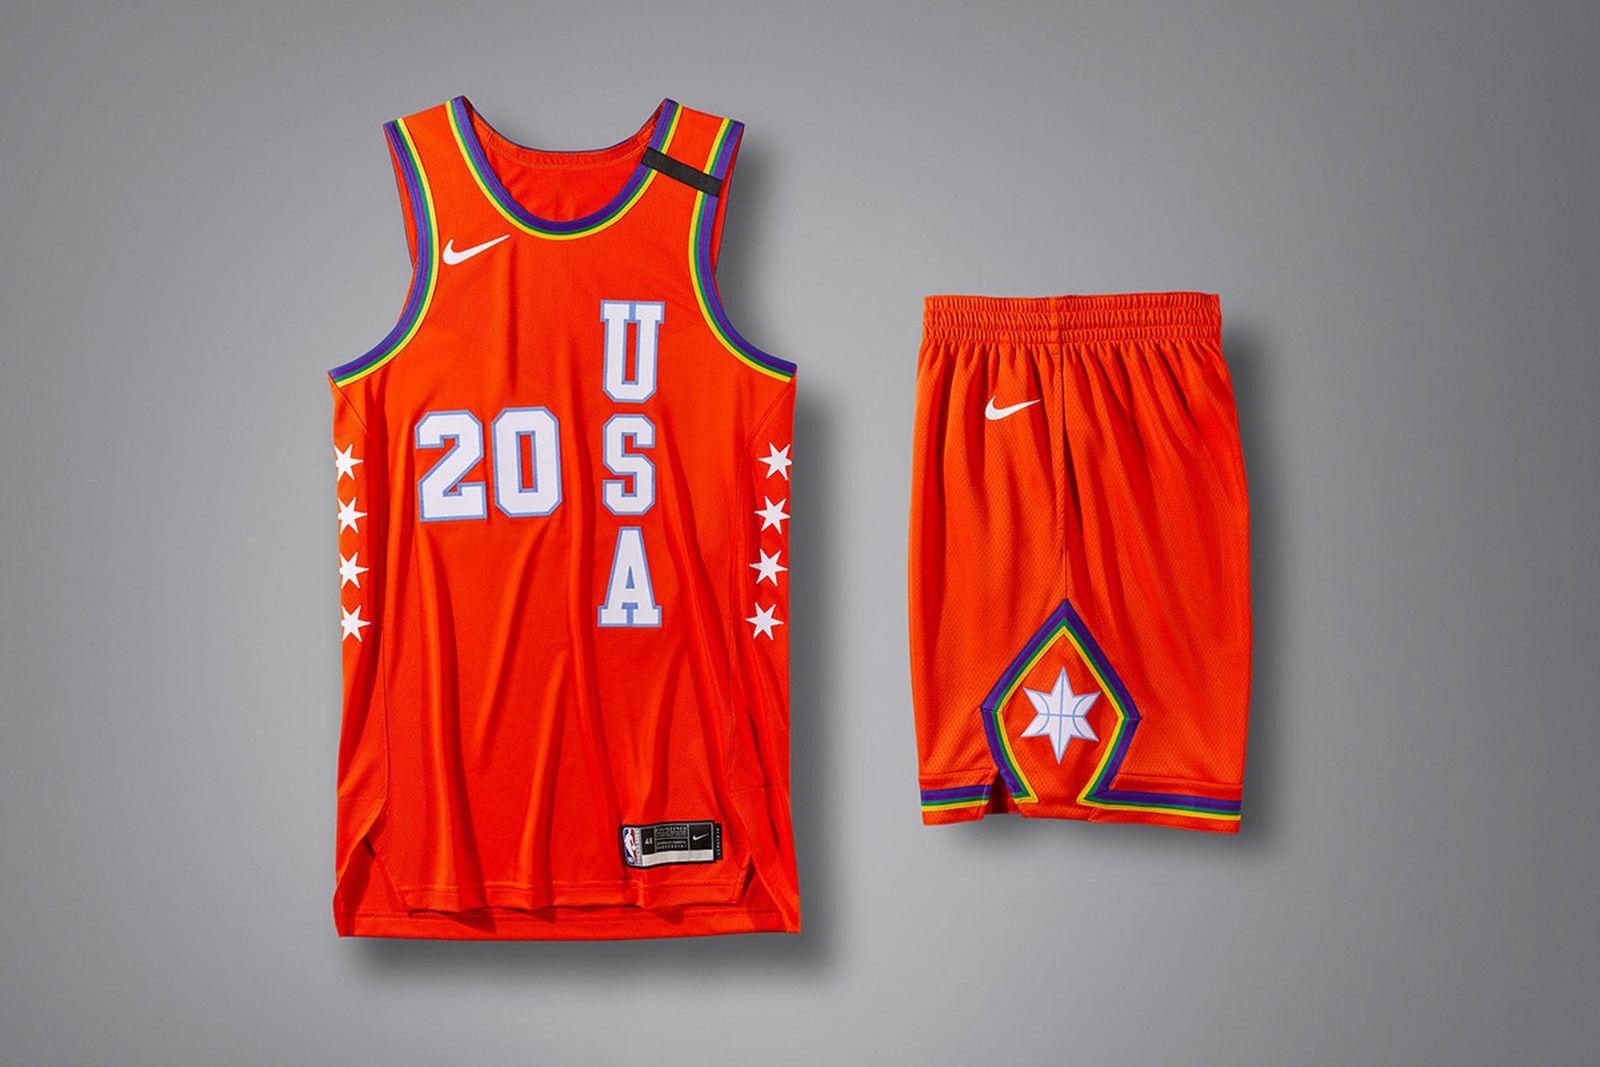 jordan-brand-nba-star-game-uniforms-07